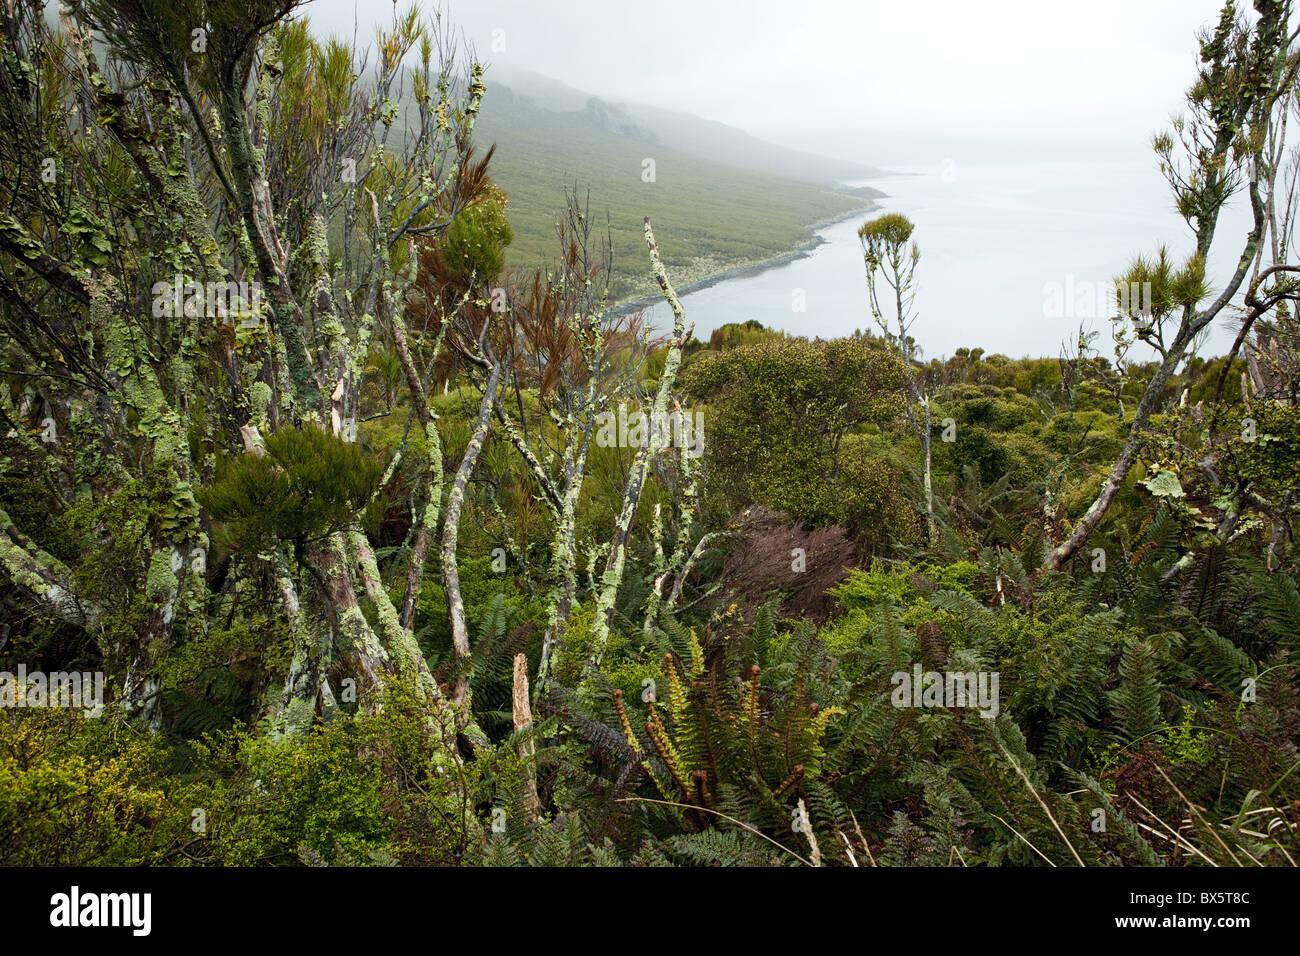 Flora on Campbell Island, Sub-Antarctic, Polar Regions - Stock Image